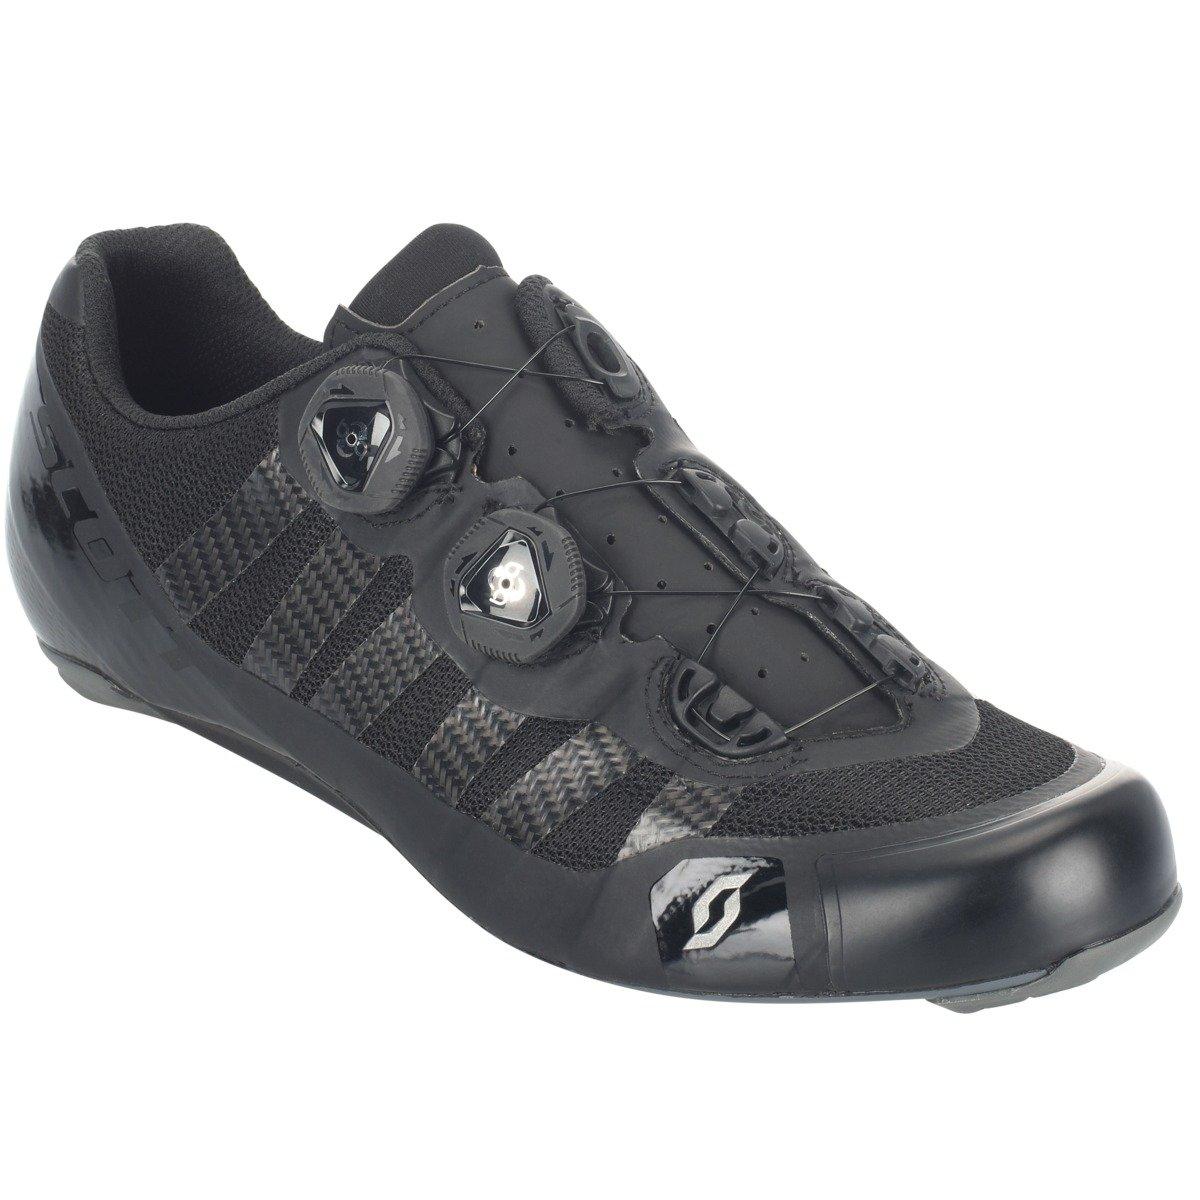 Scott Road RC Ultimate Cycling Shoe - Men's Black, 45.0 by Scott